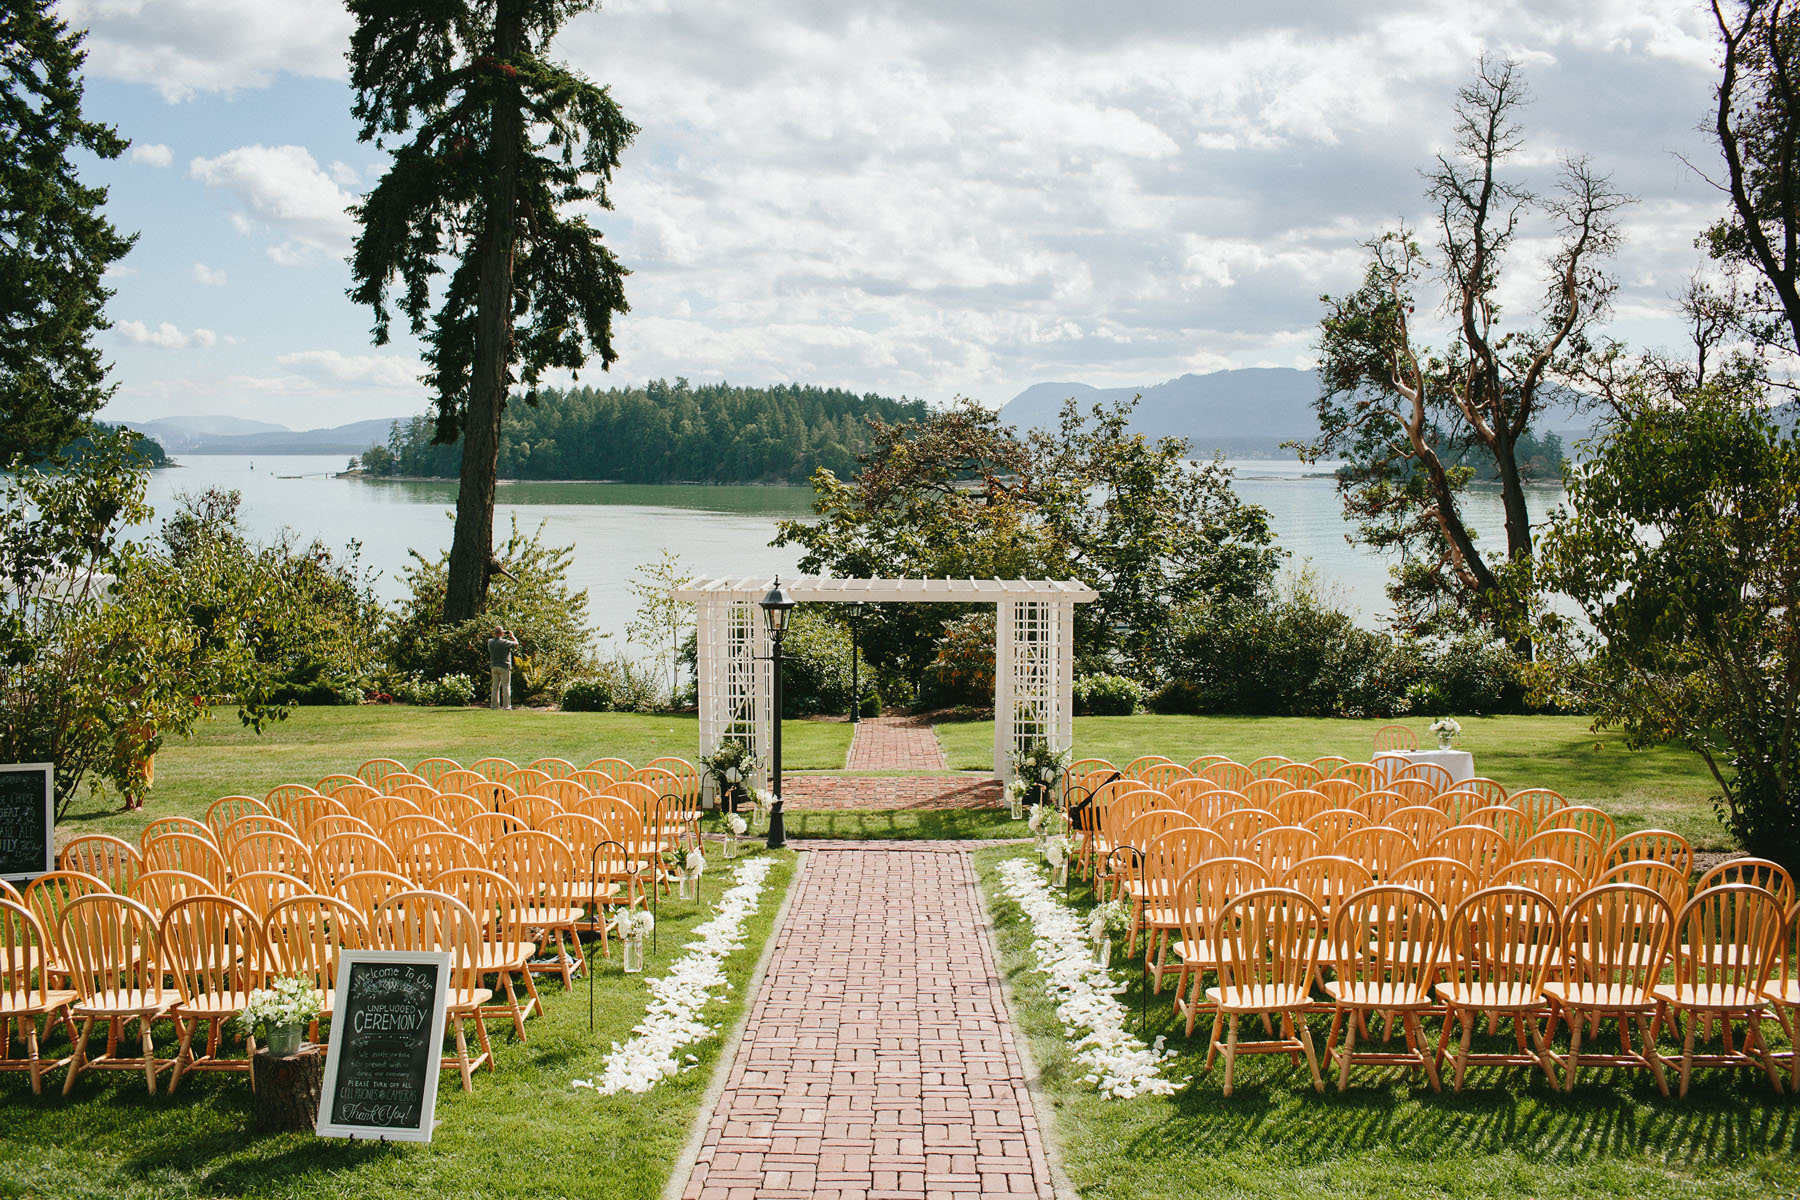 thetis-island-wedding-photographer-rp-rn-063.jpg